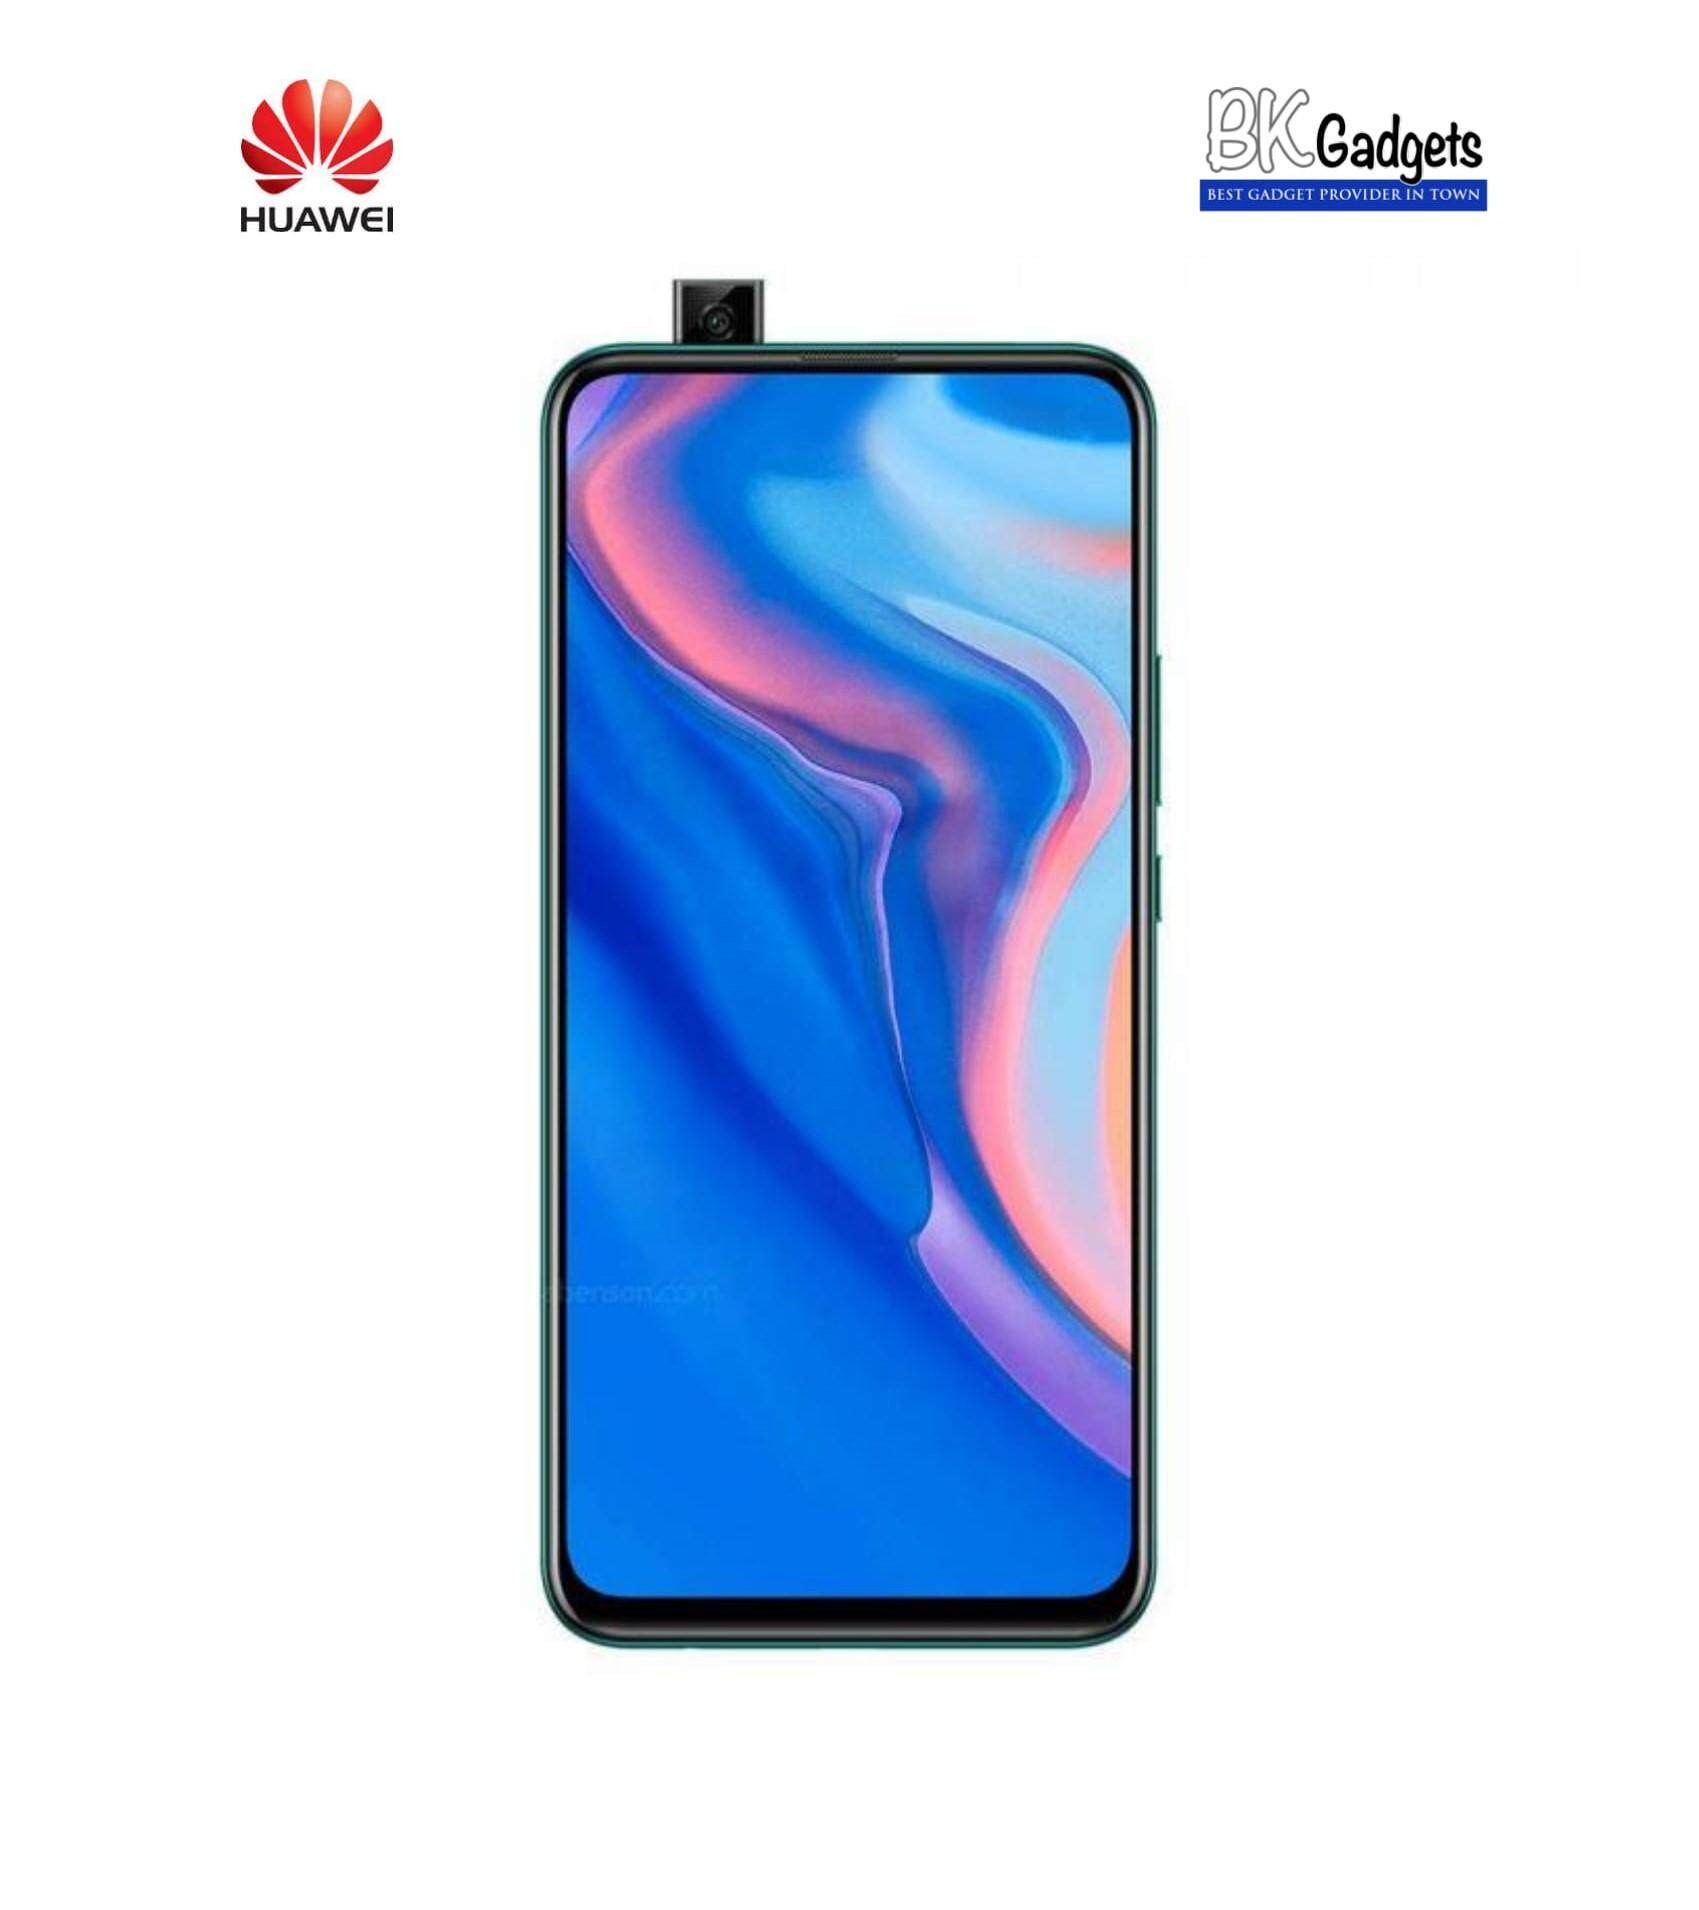 HUAWEI Y9 Prime 2019 Emerald Green [ 4GB RAM+128GB ROM ] SMARTPHONE